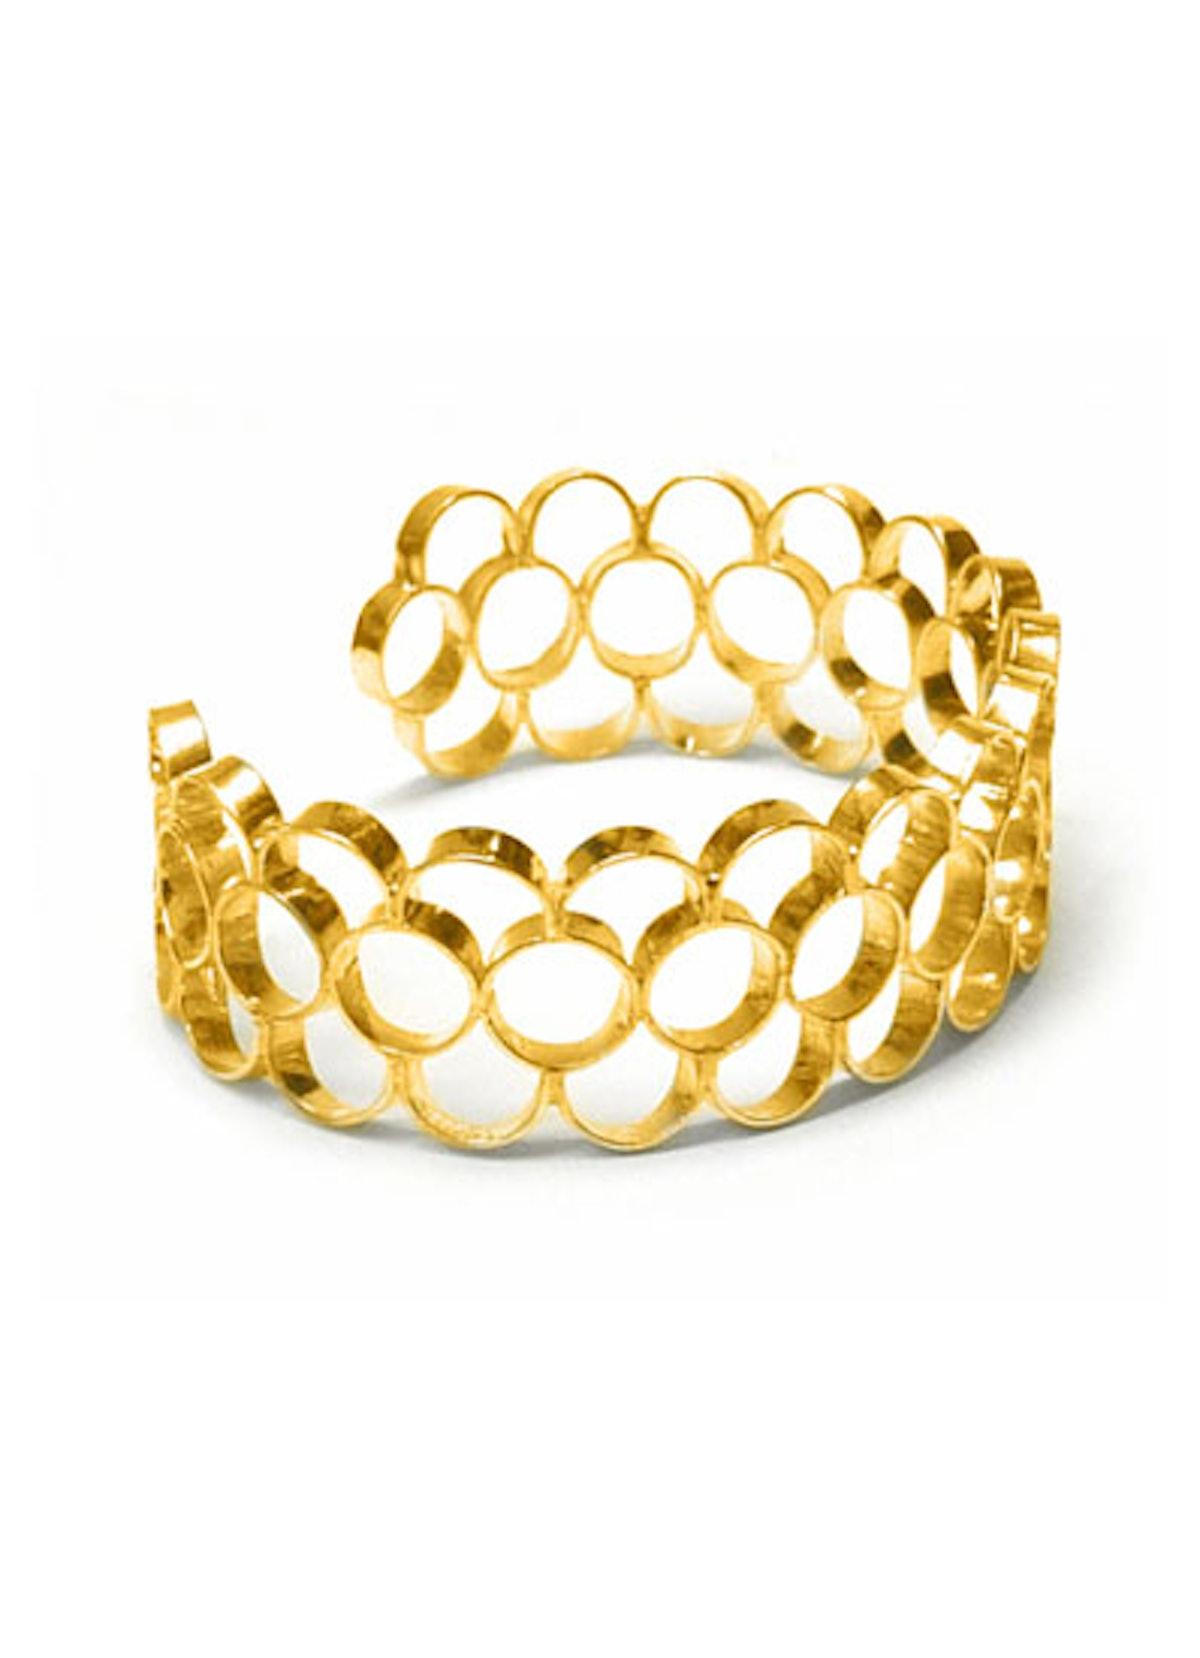 acss-geometric-cuffs-03-v.jpg